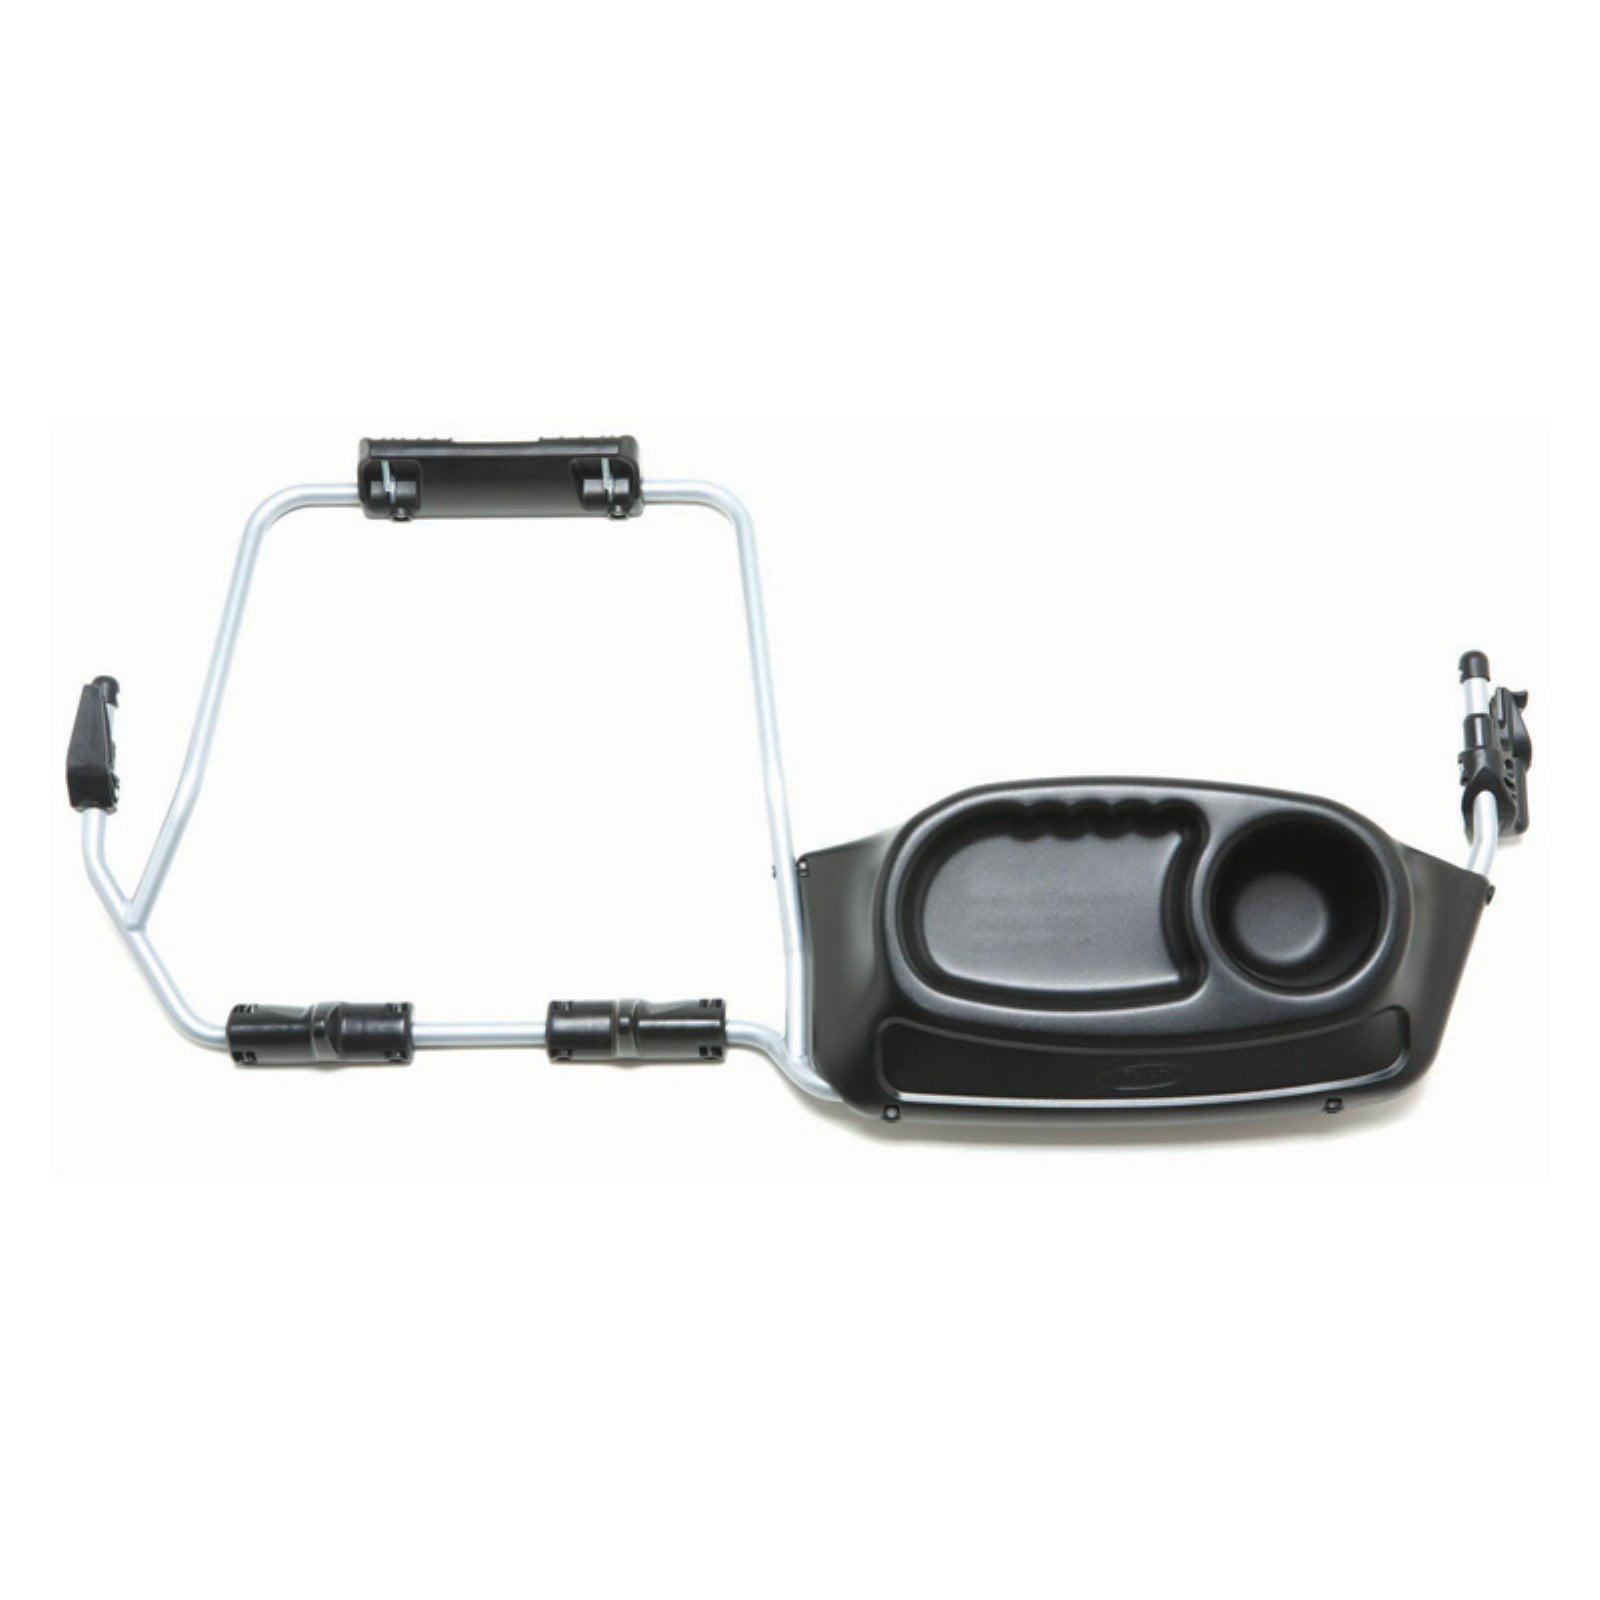 Bob Strollers B.O.B. Duallie ICSA Graco Car Seat Adapter